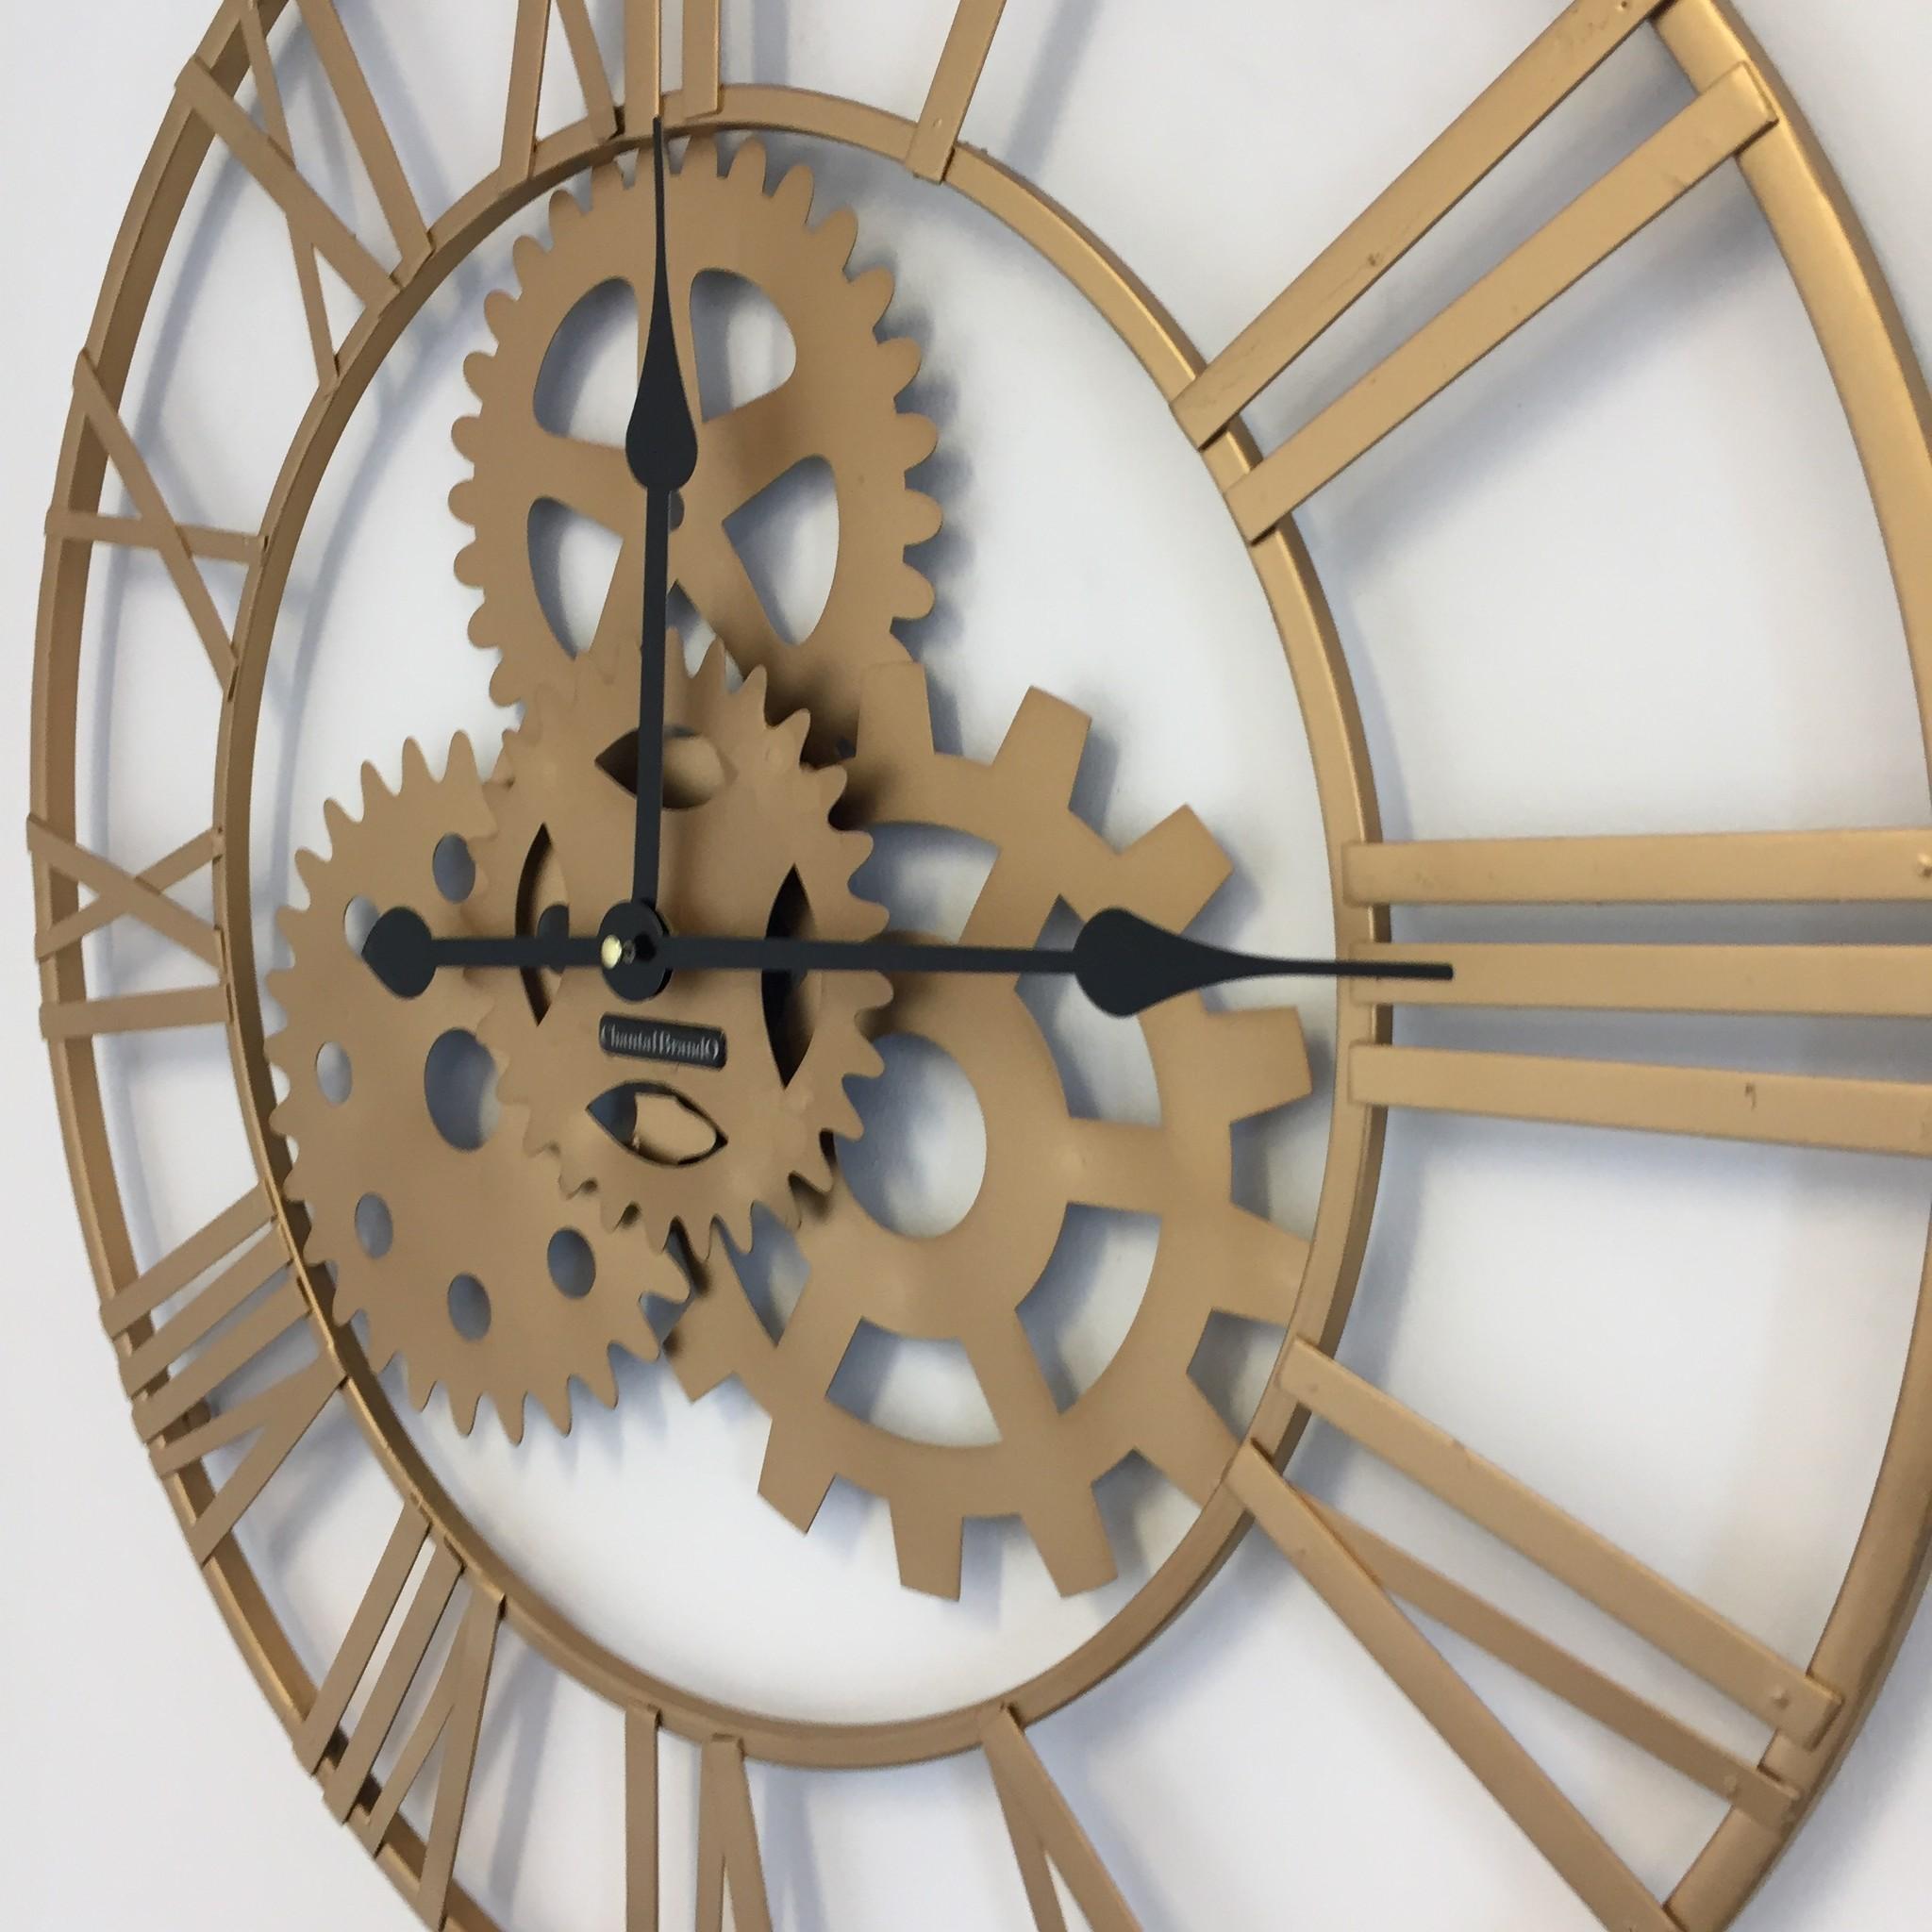 ChantalBrandO Wandklok Golden Nugget Vintage Industrieel